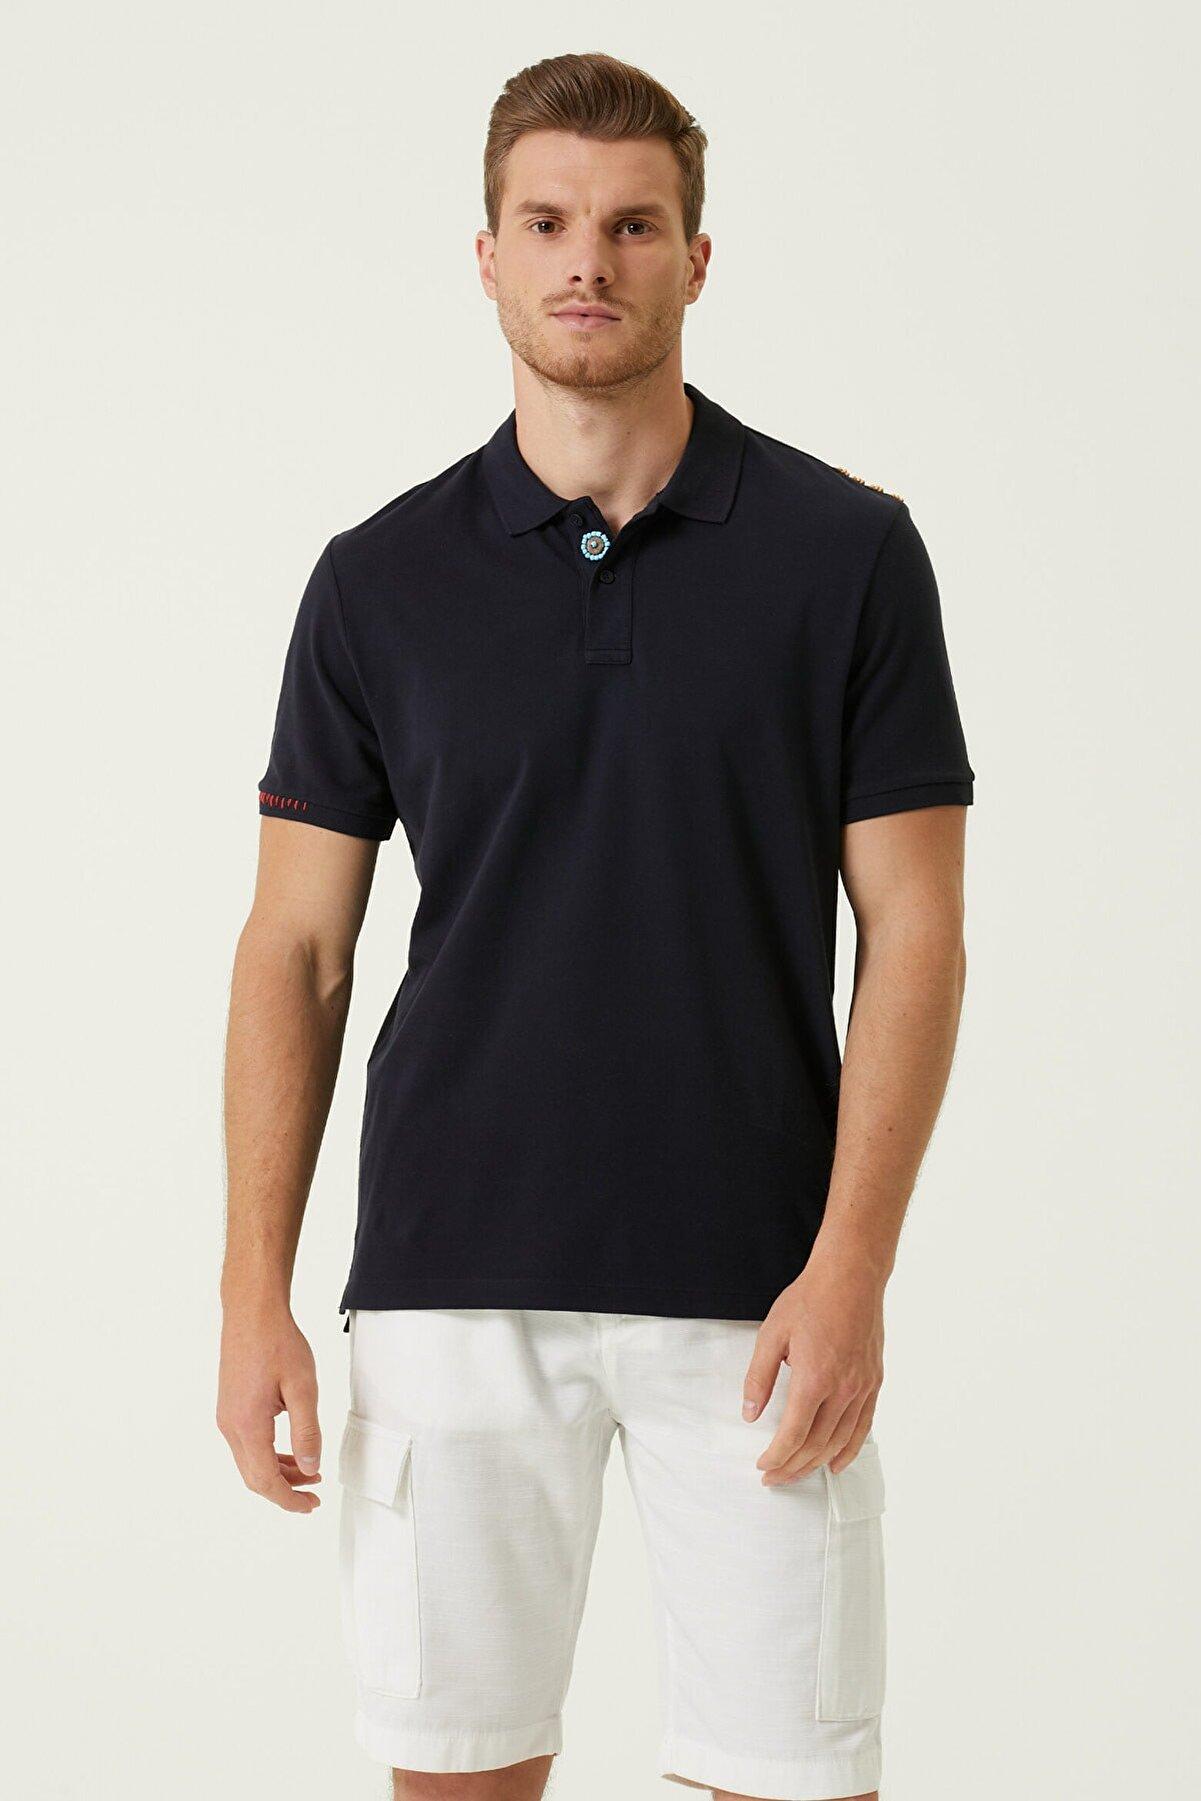 Network Erkek Comfort Fit Lacivert Polo Yaka T-shirt 1078122